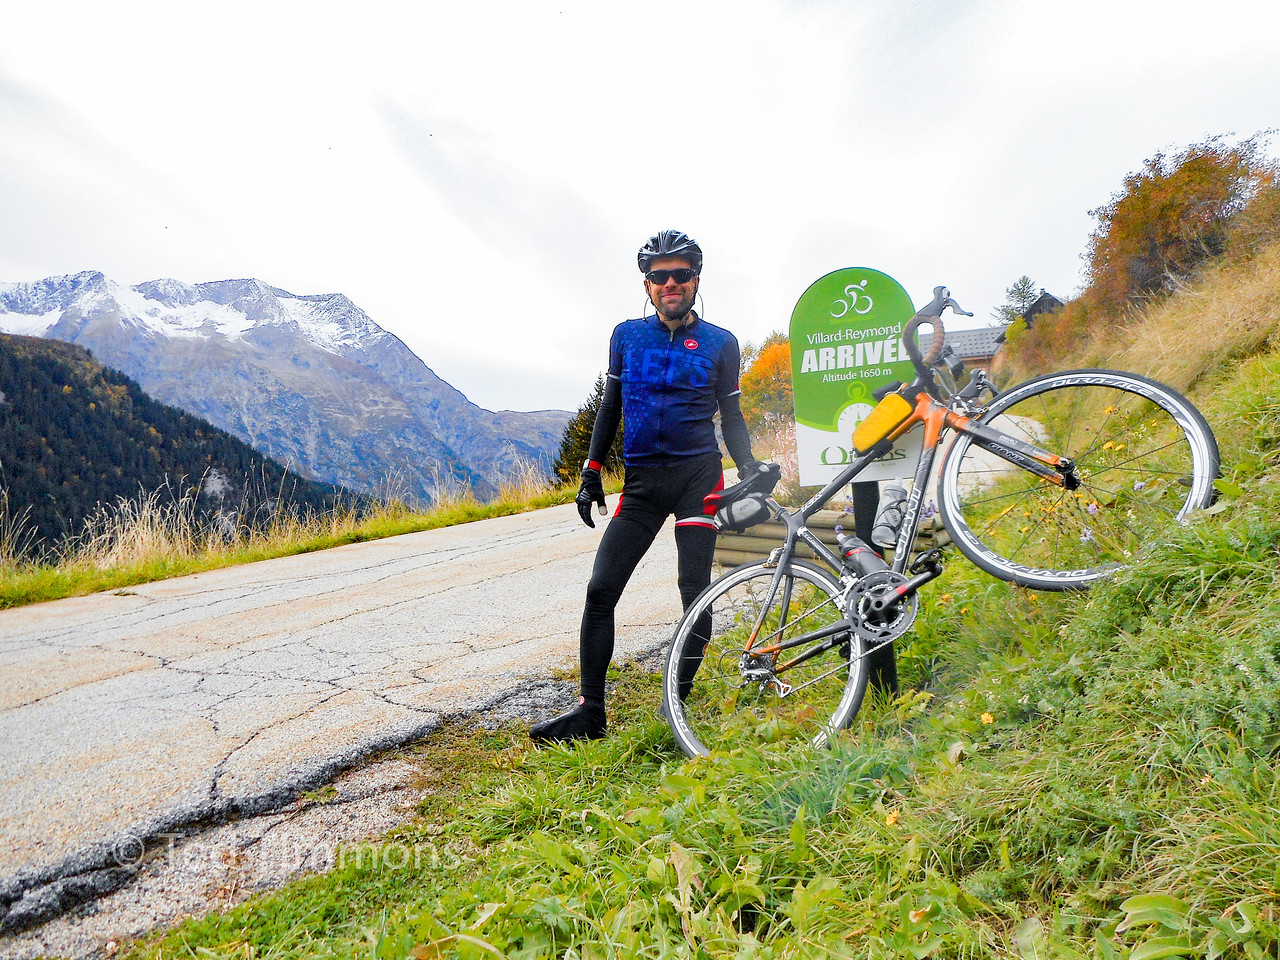 At the official top of the Villard-Reymond climb.